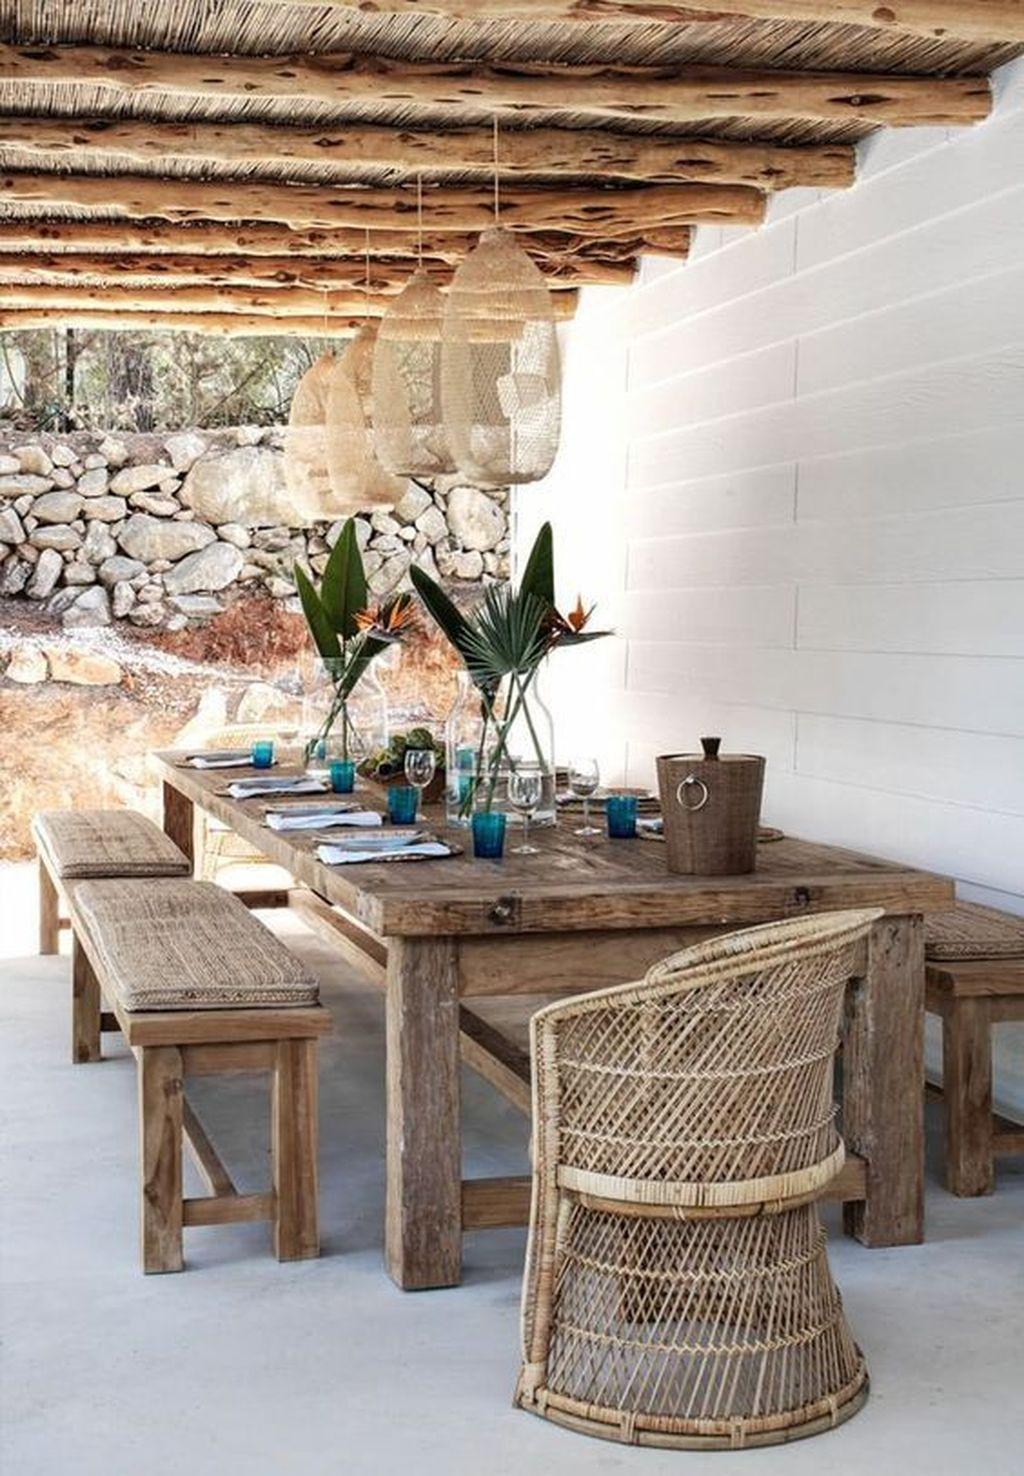 Inspiring Outdoor Dining Table Design Ideas 21